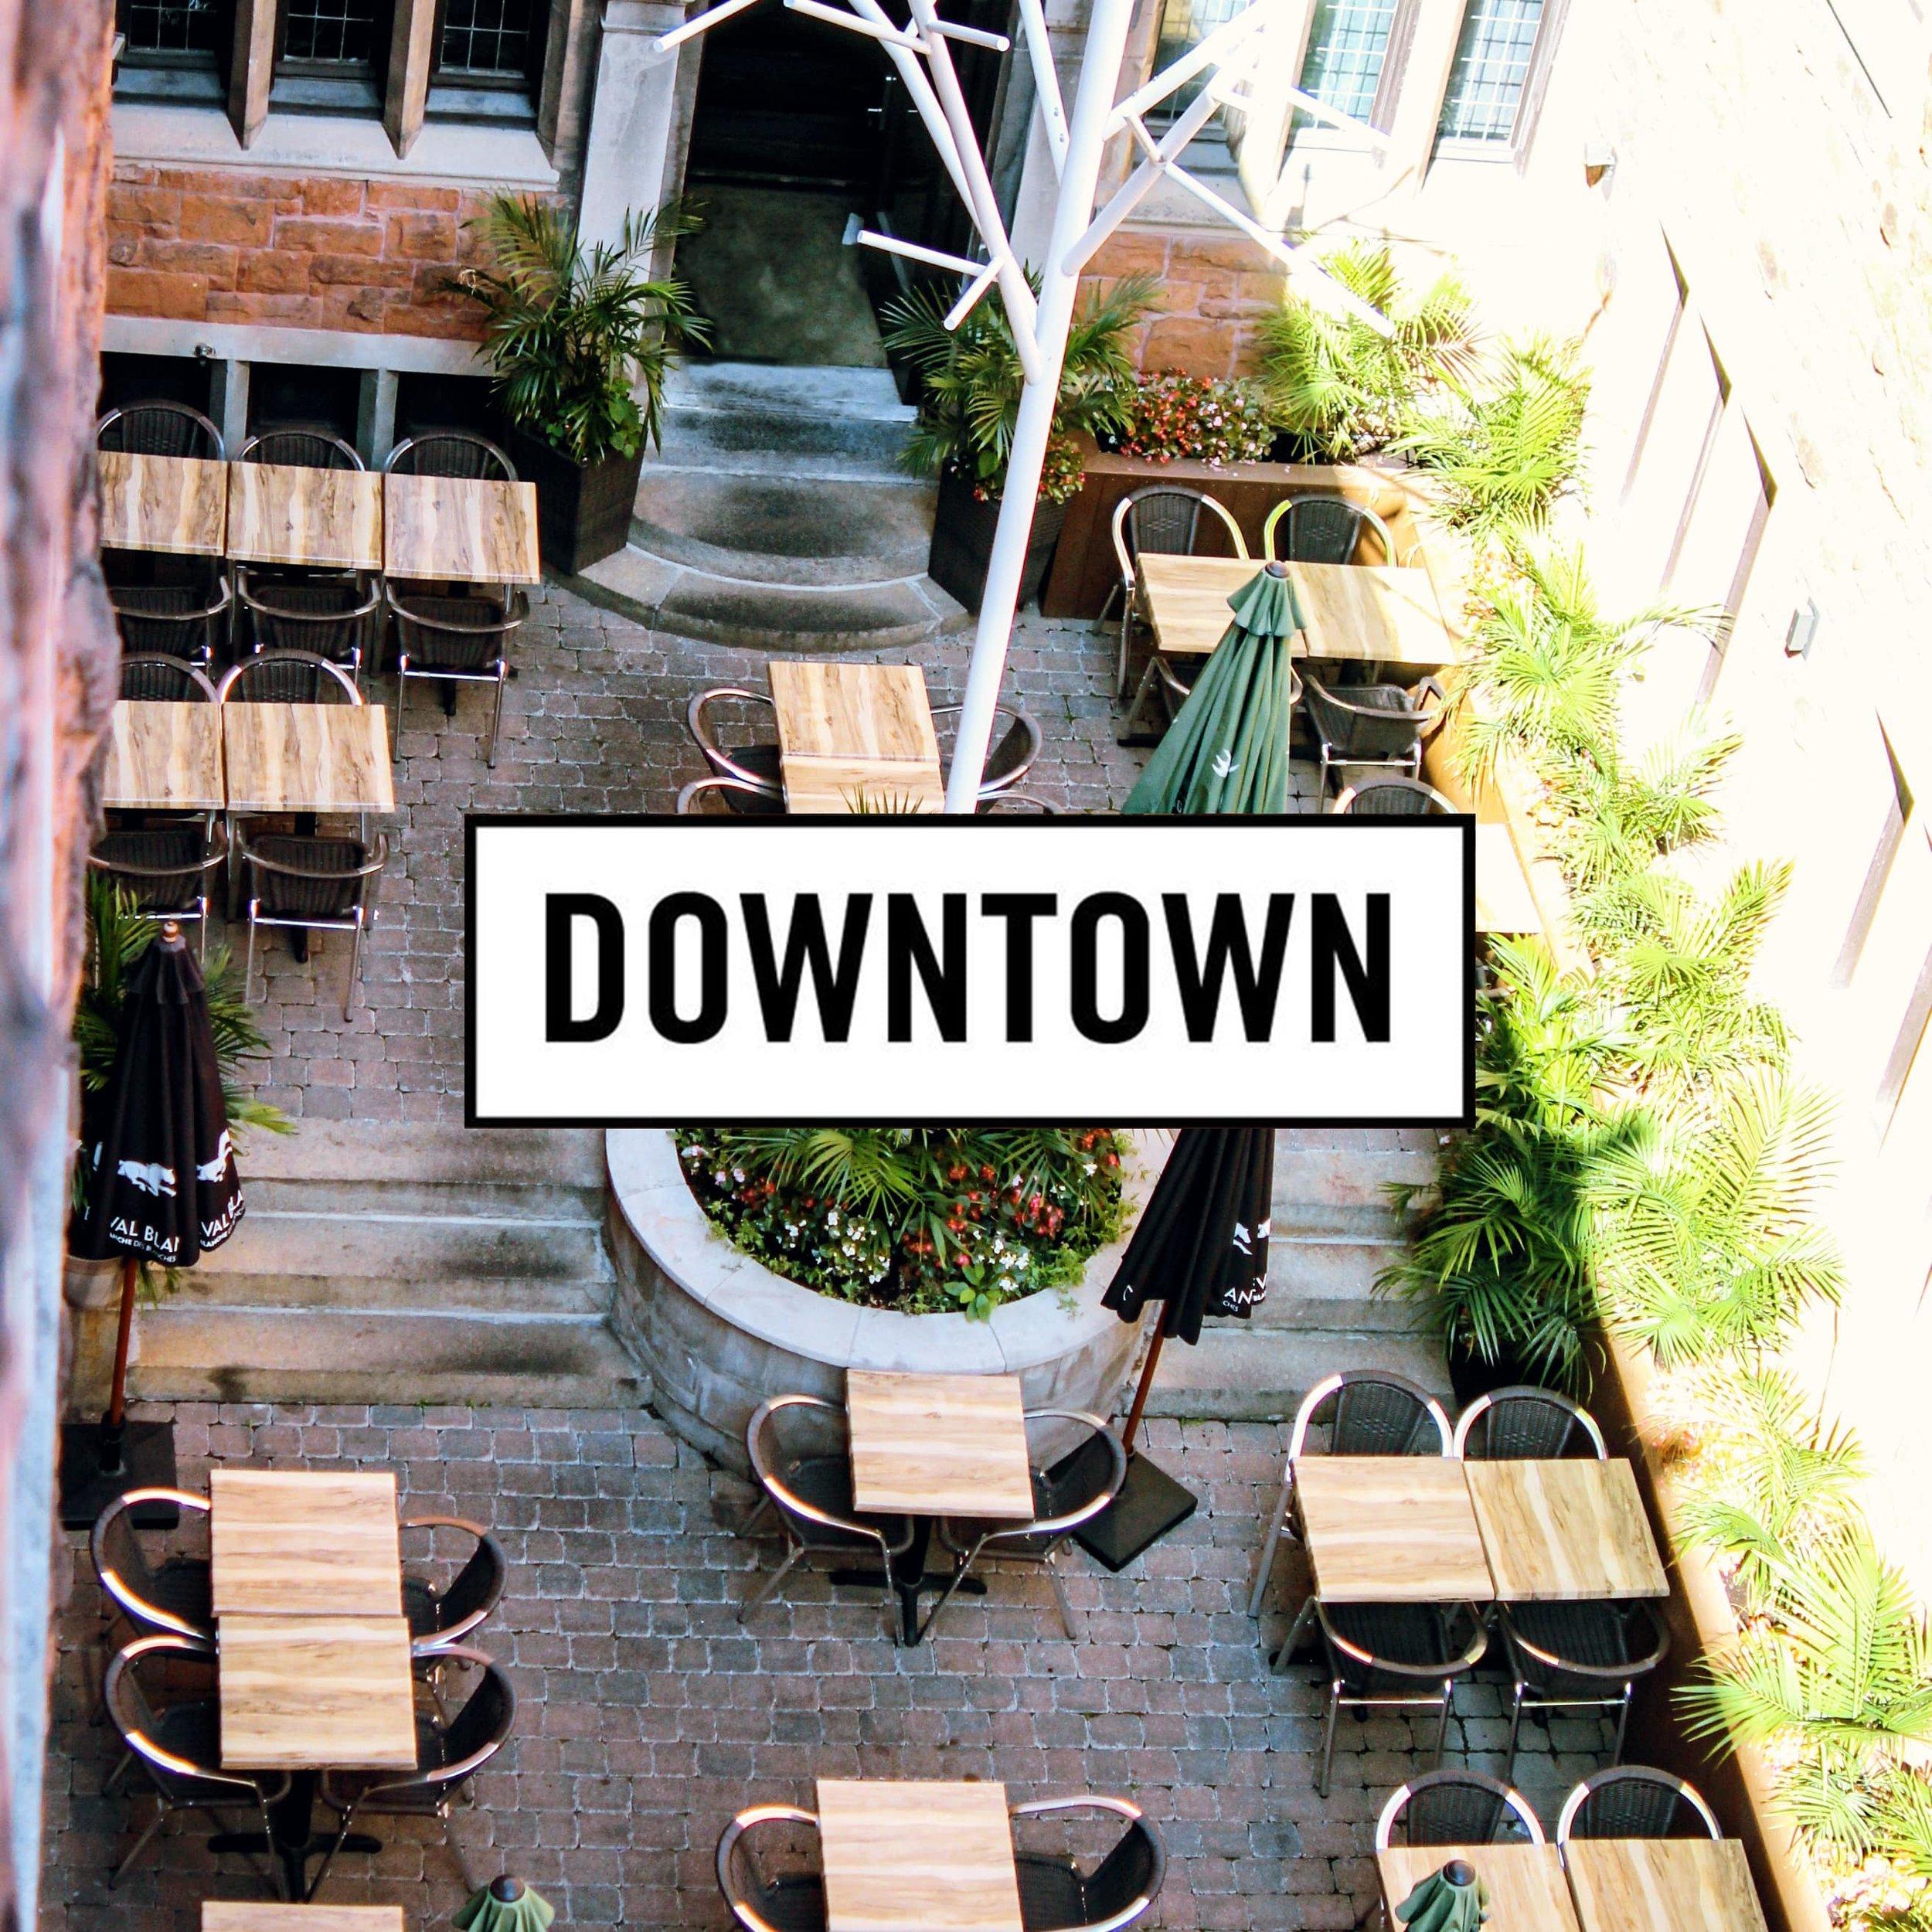 Downtown-min.jpg